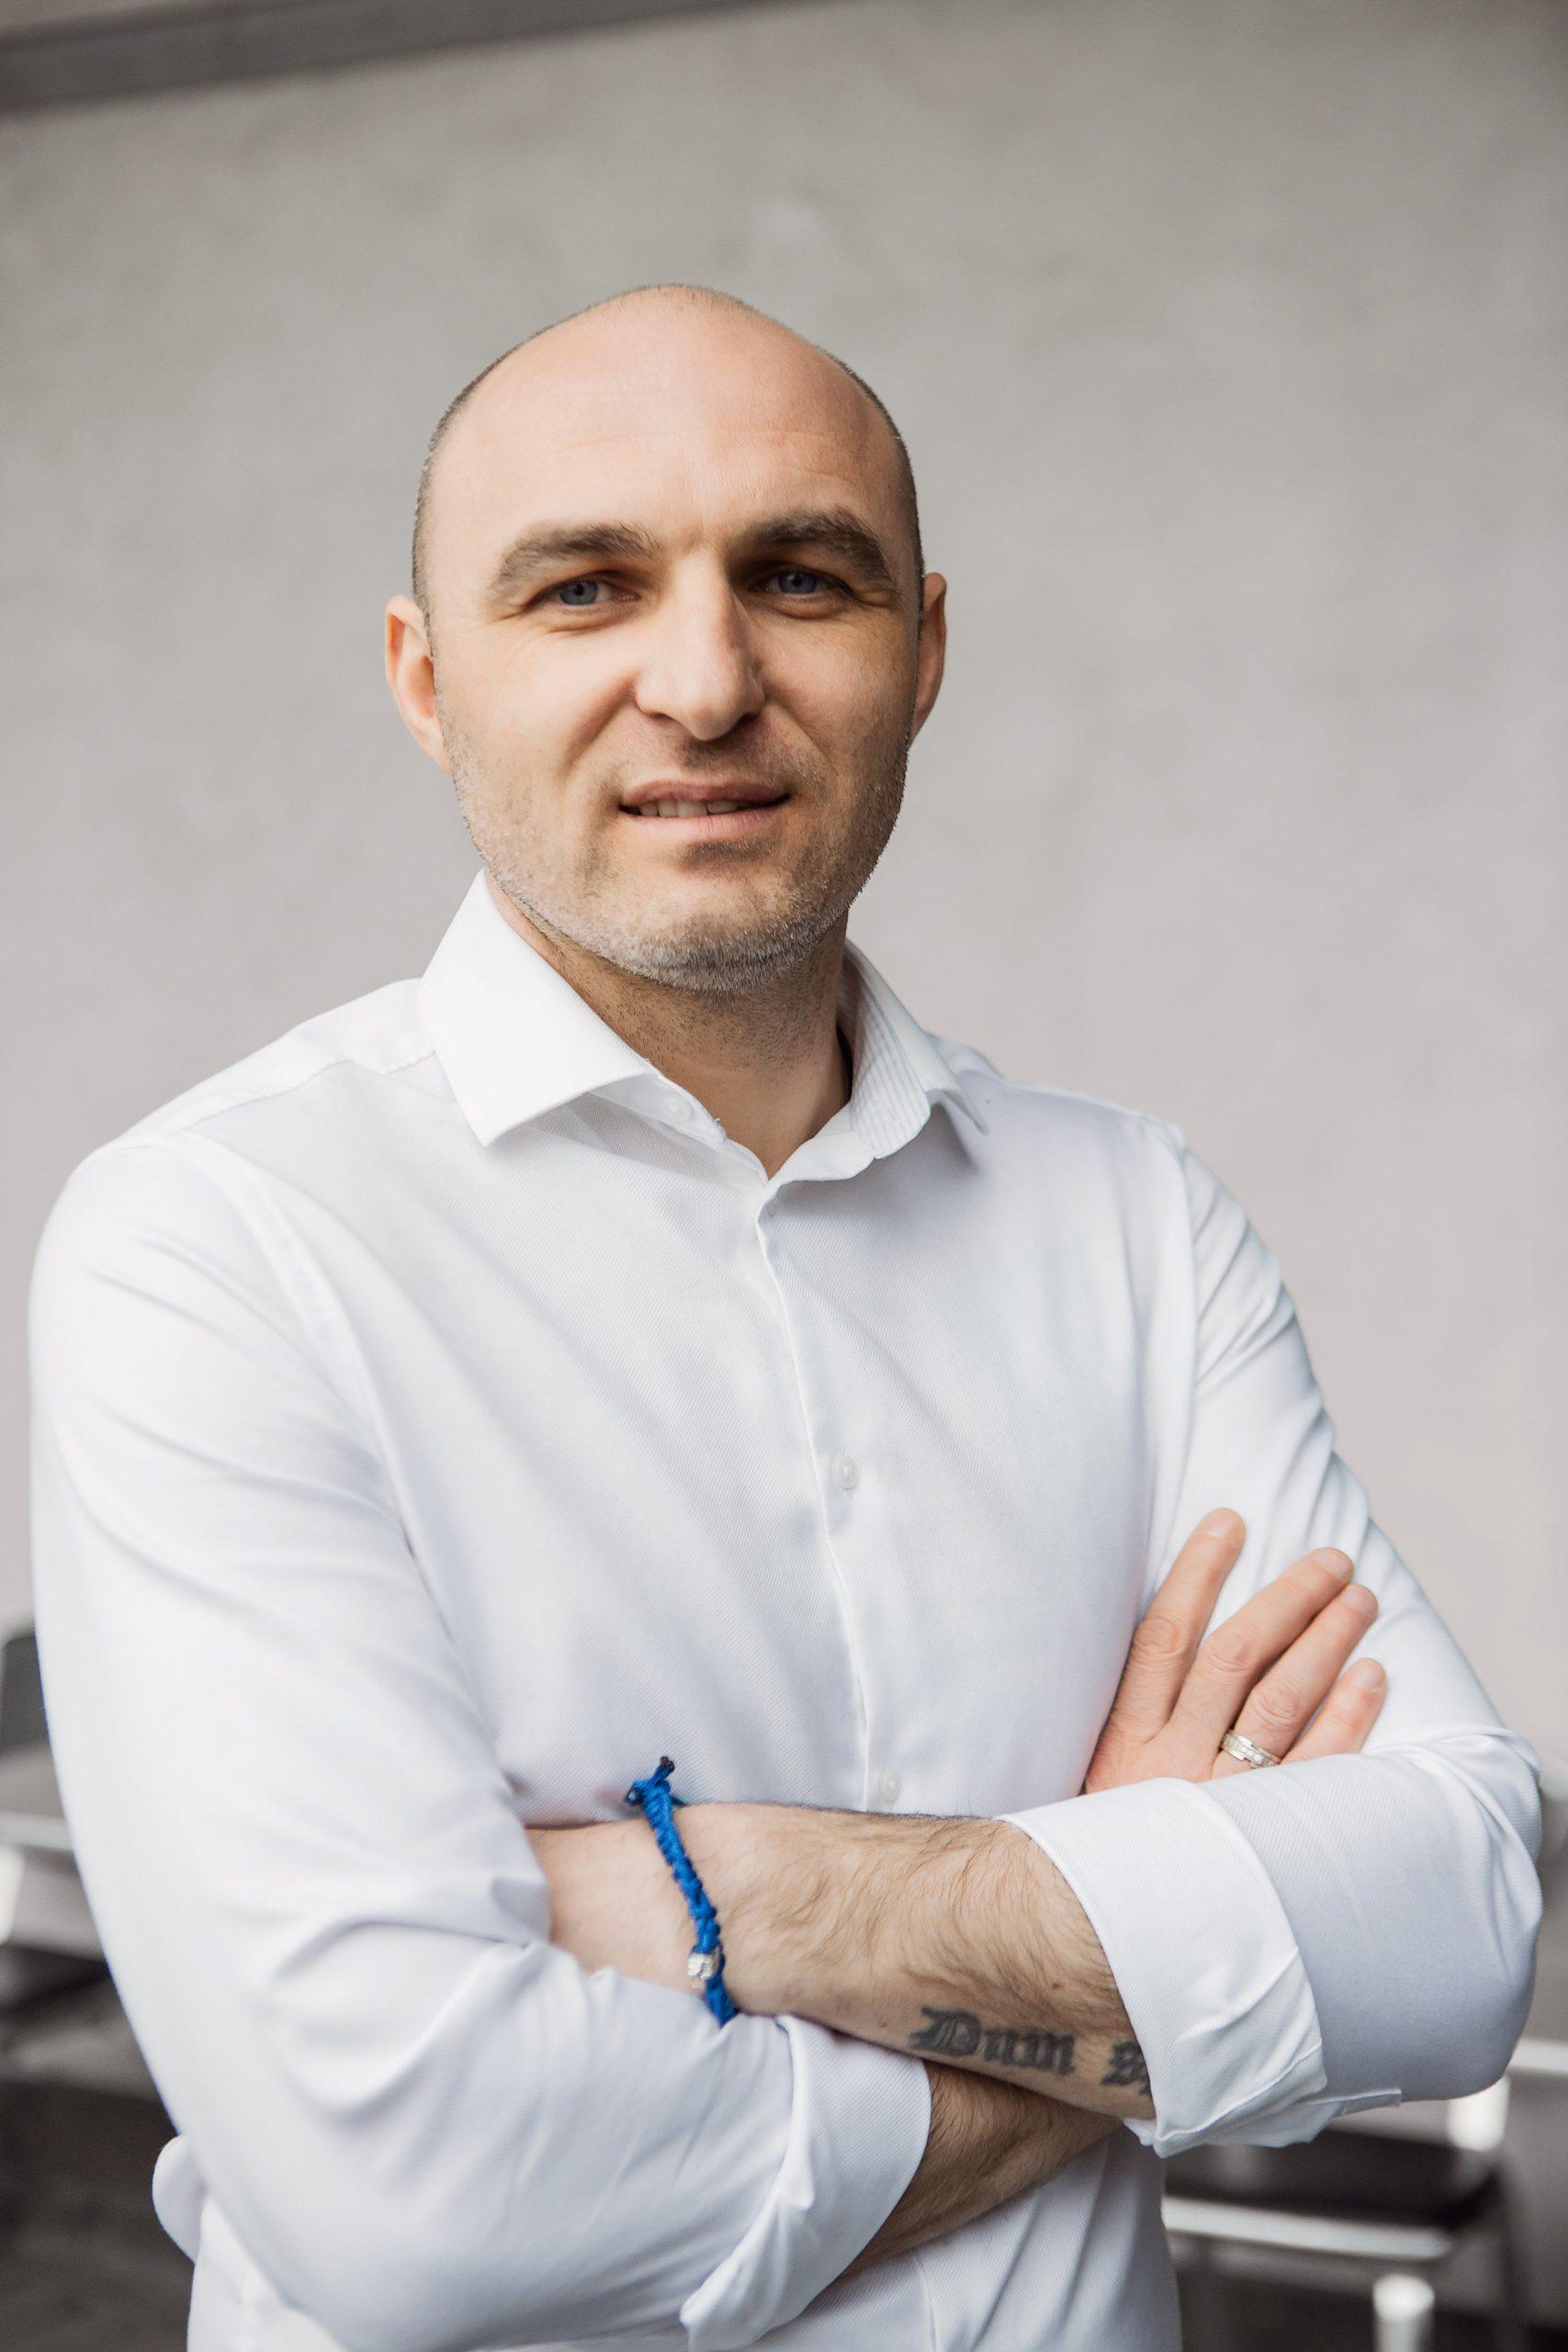 Гатупов Юрий Сергеевич